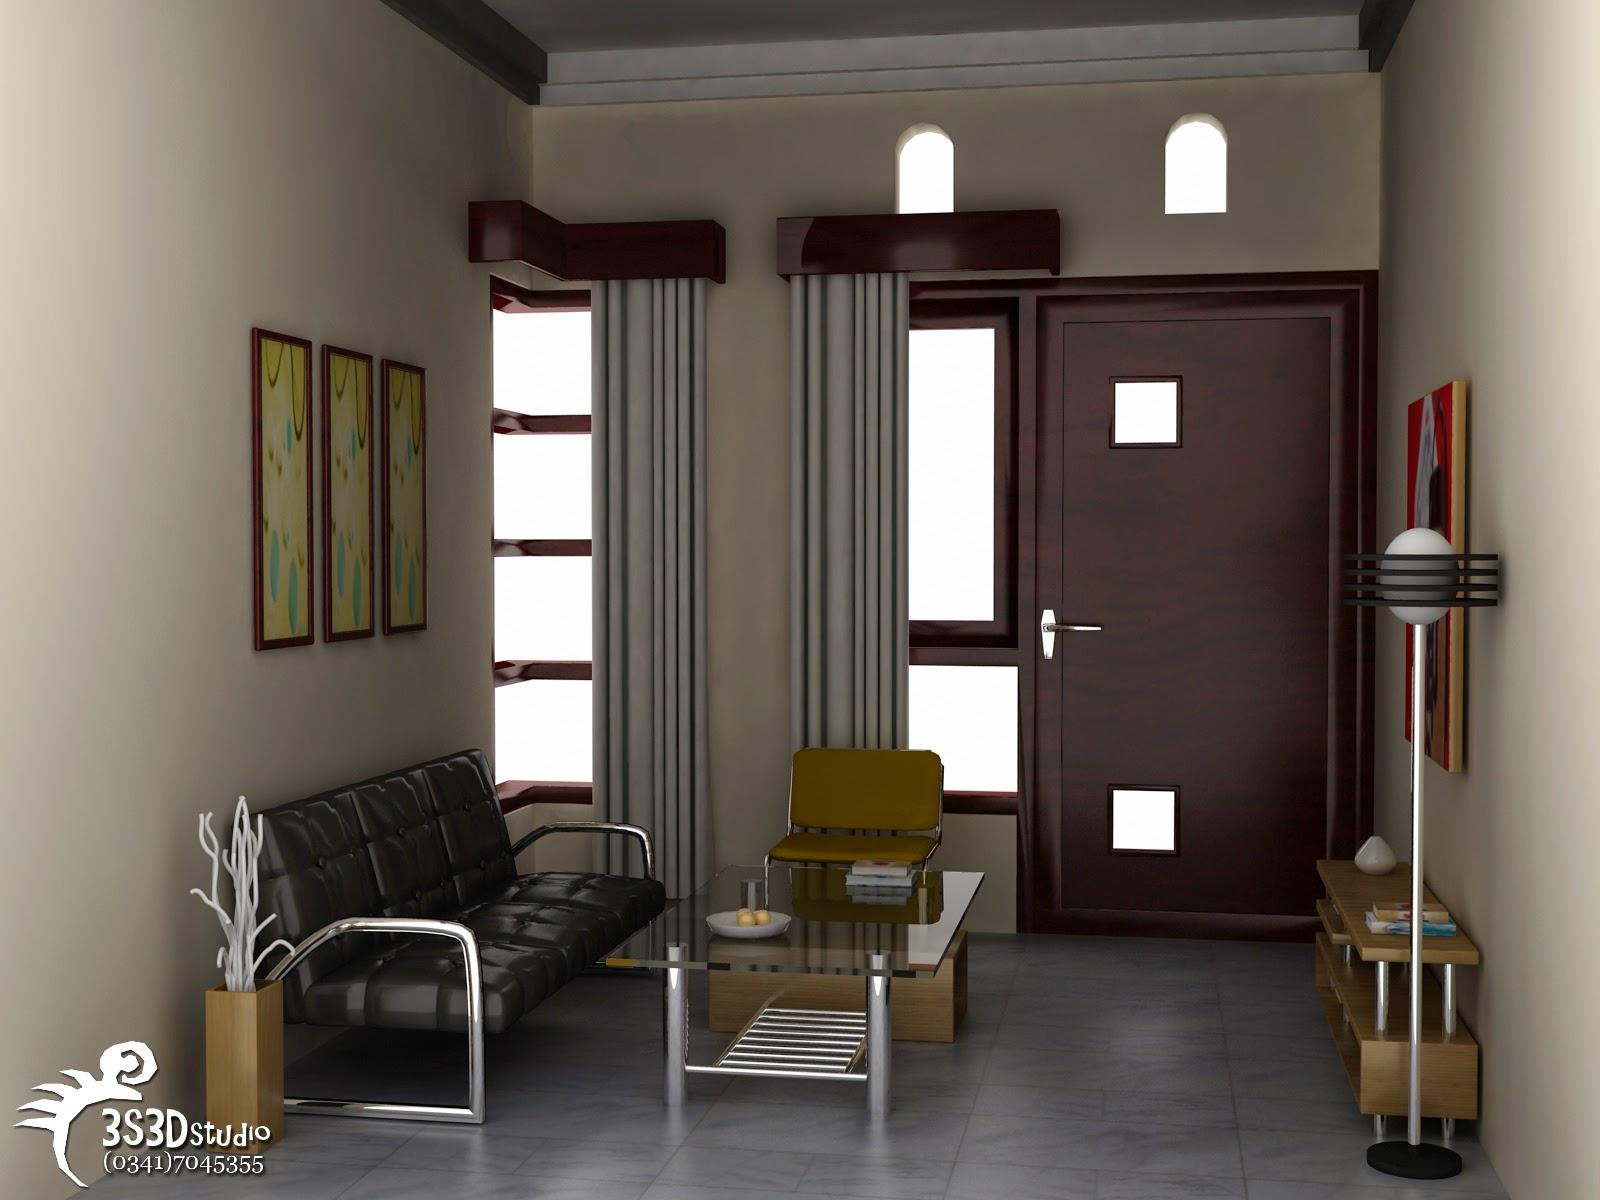 Design Interior Rumah Minimalis Type 36 60 Desain Rumah Minimalis